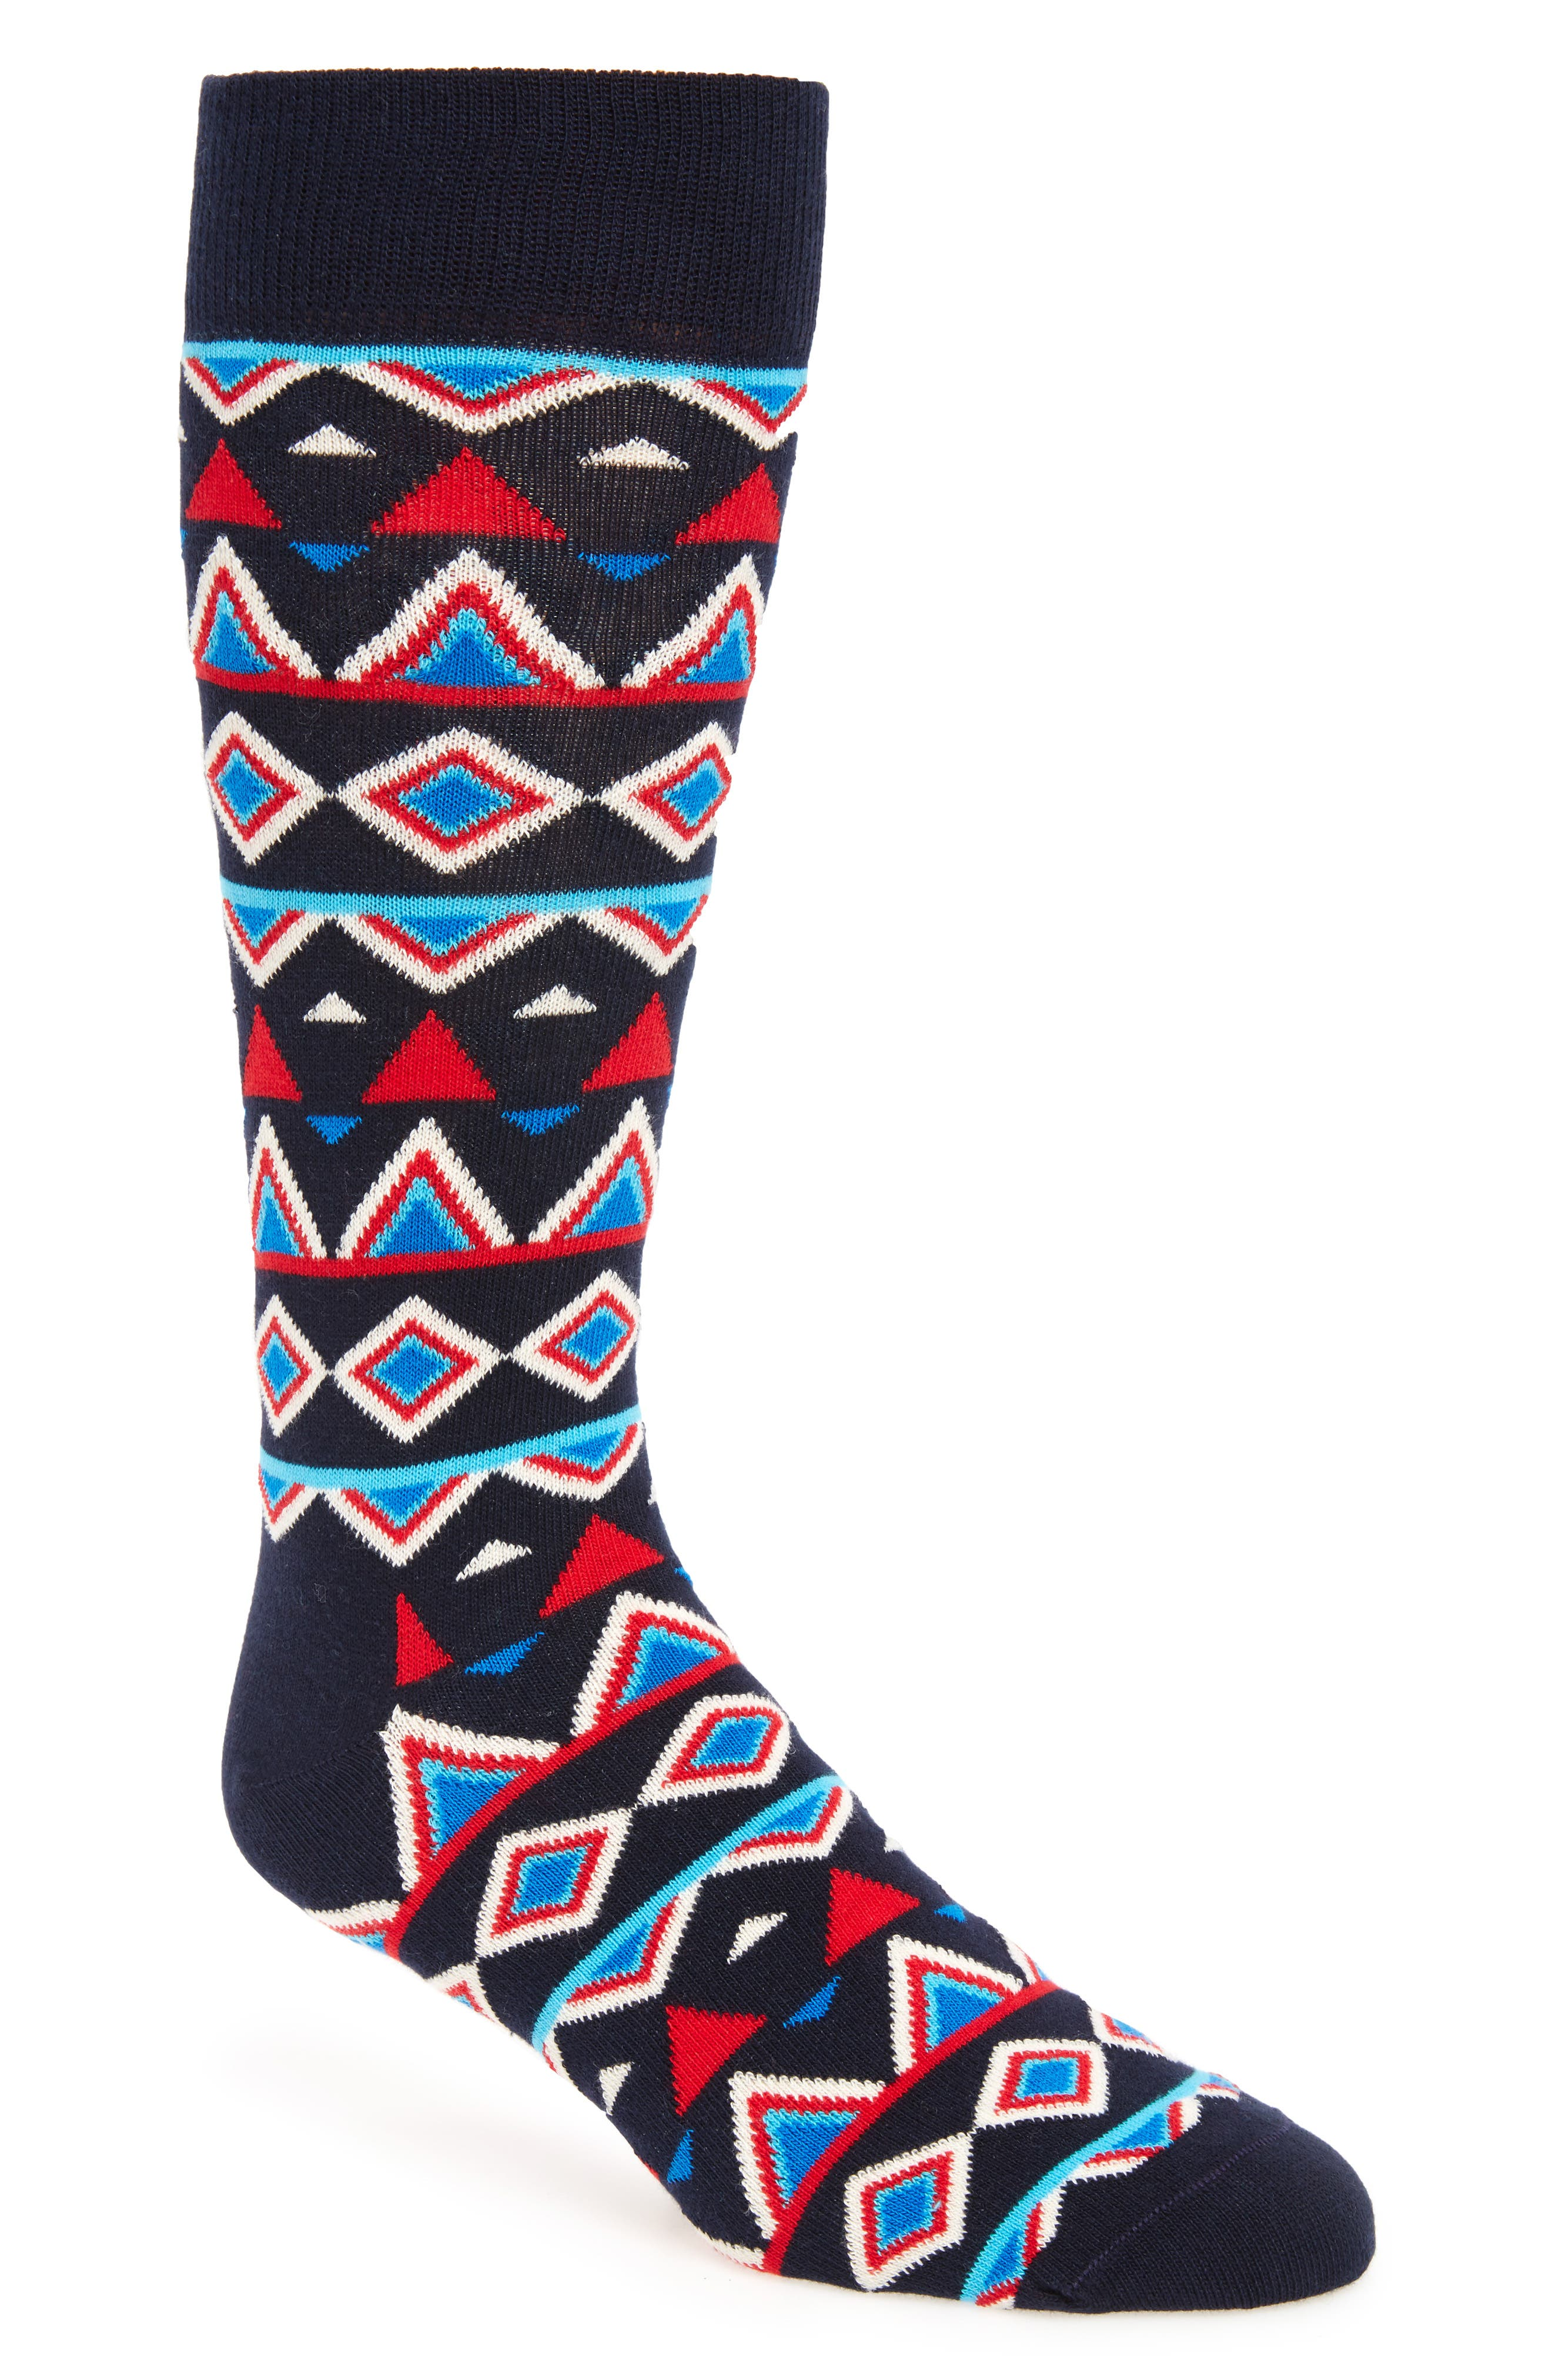 HAPPY SOCKS Temple Cotton Blend Socks